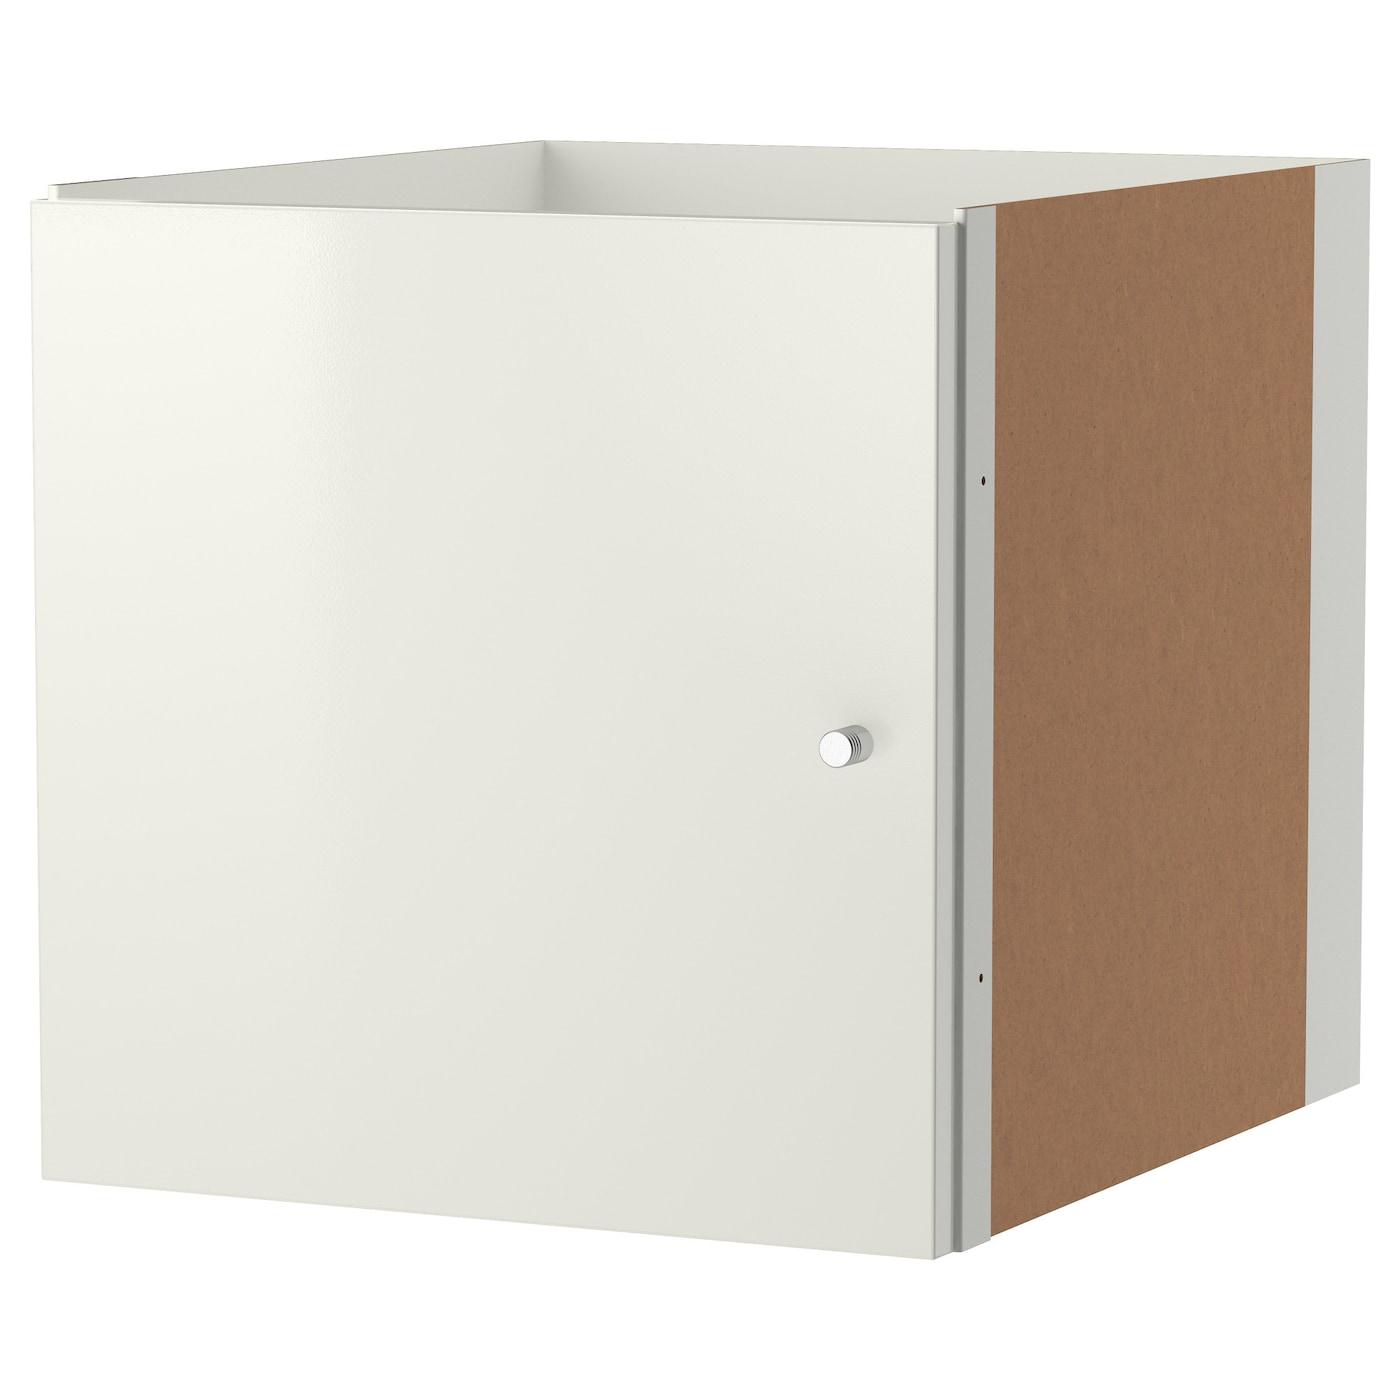 kallax desk combination white 77 x 147 cm ikea. Black Bedroom Furniture Sets. Home Design Ideas